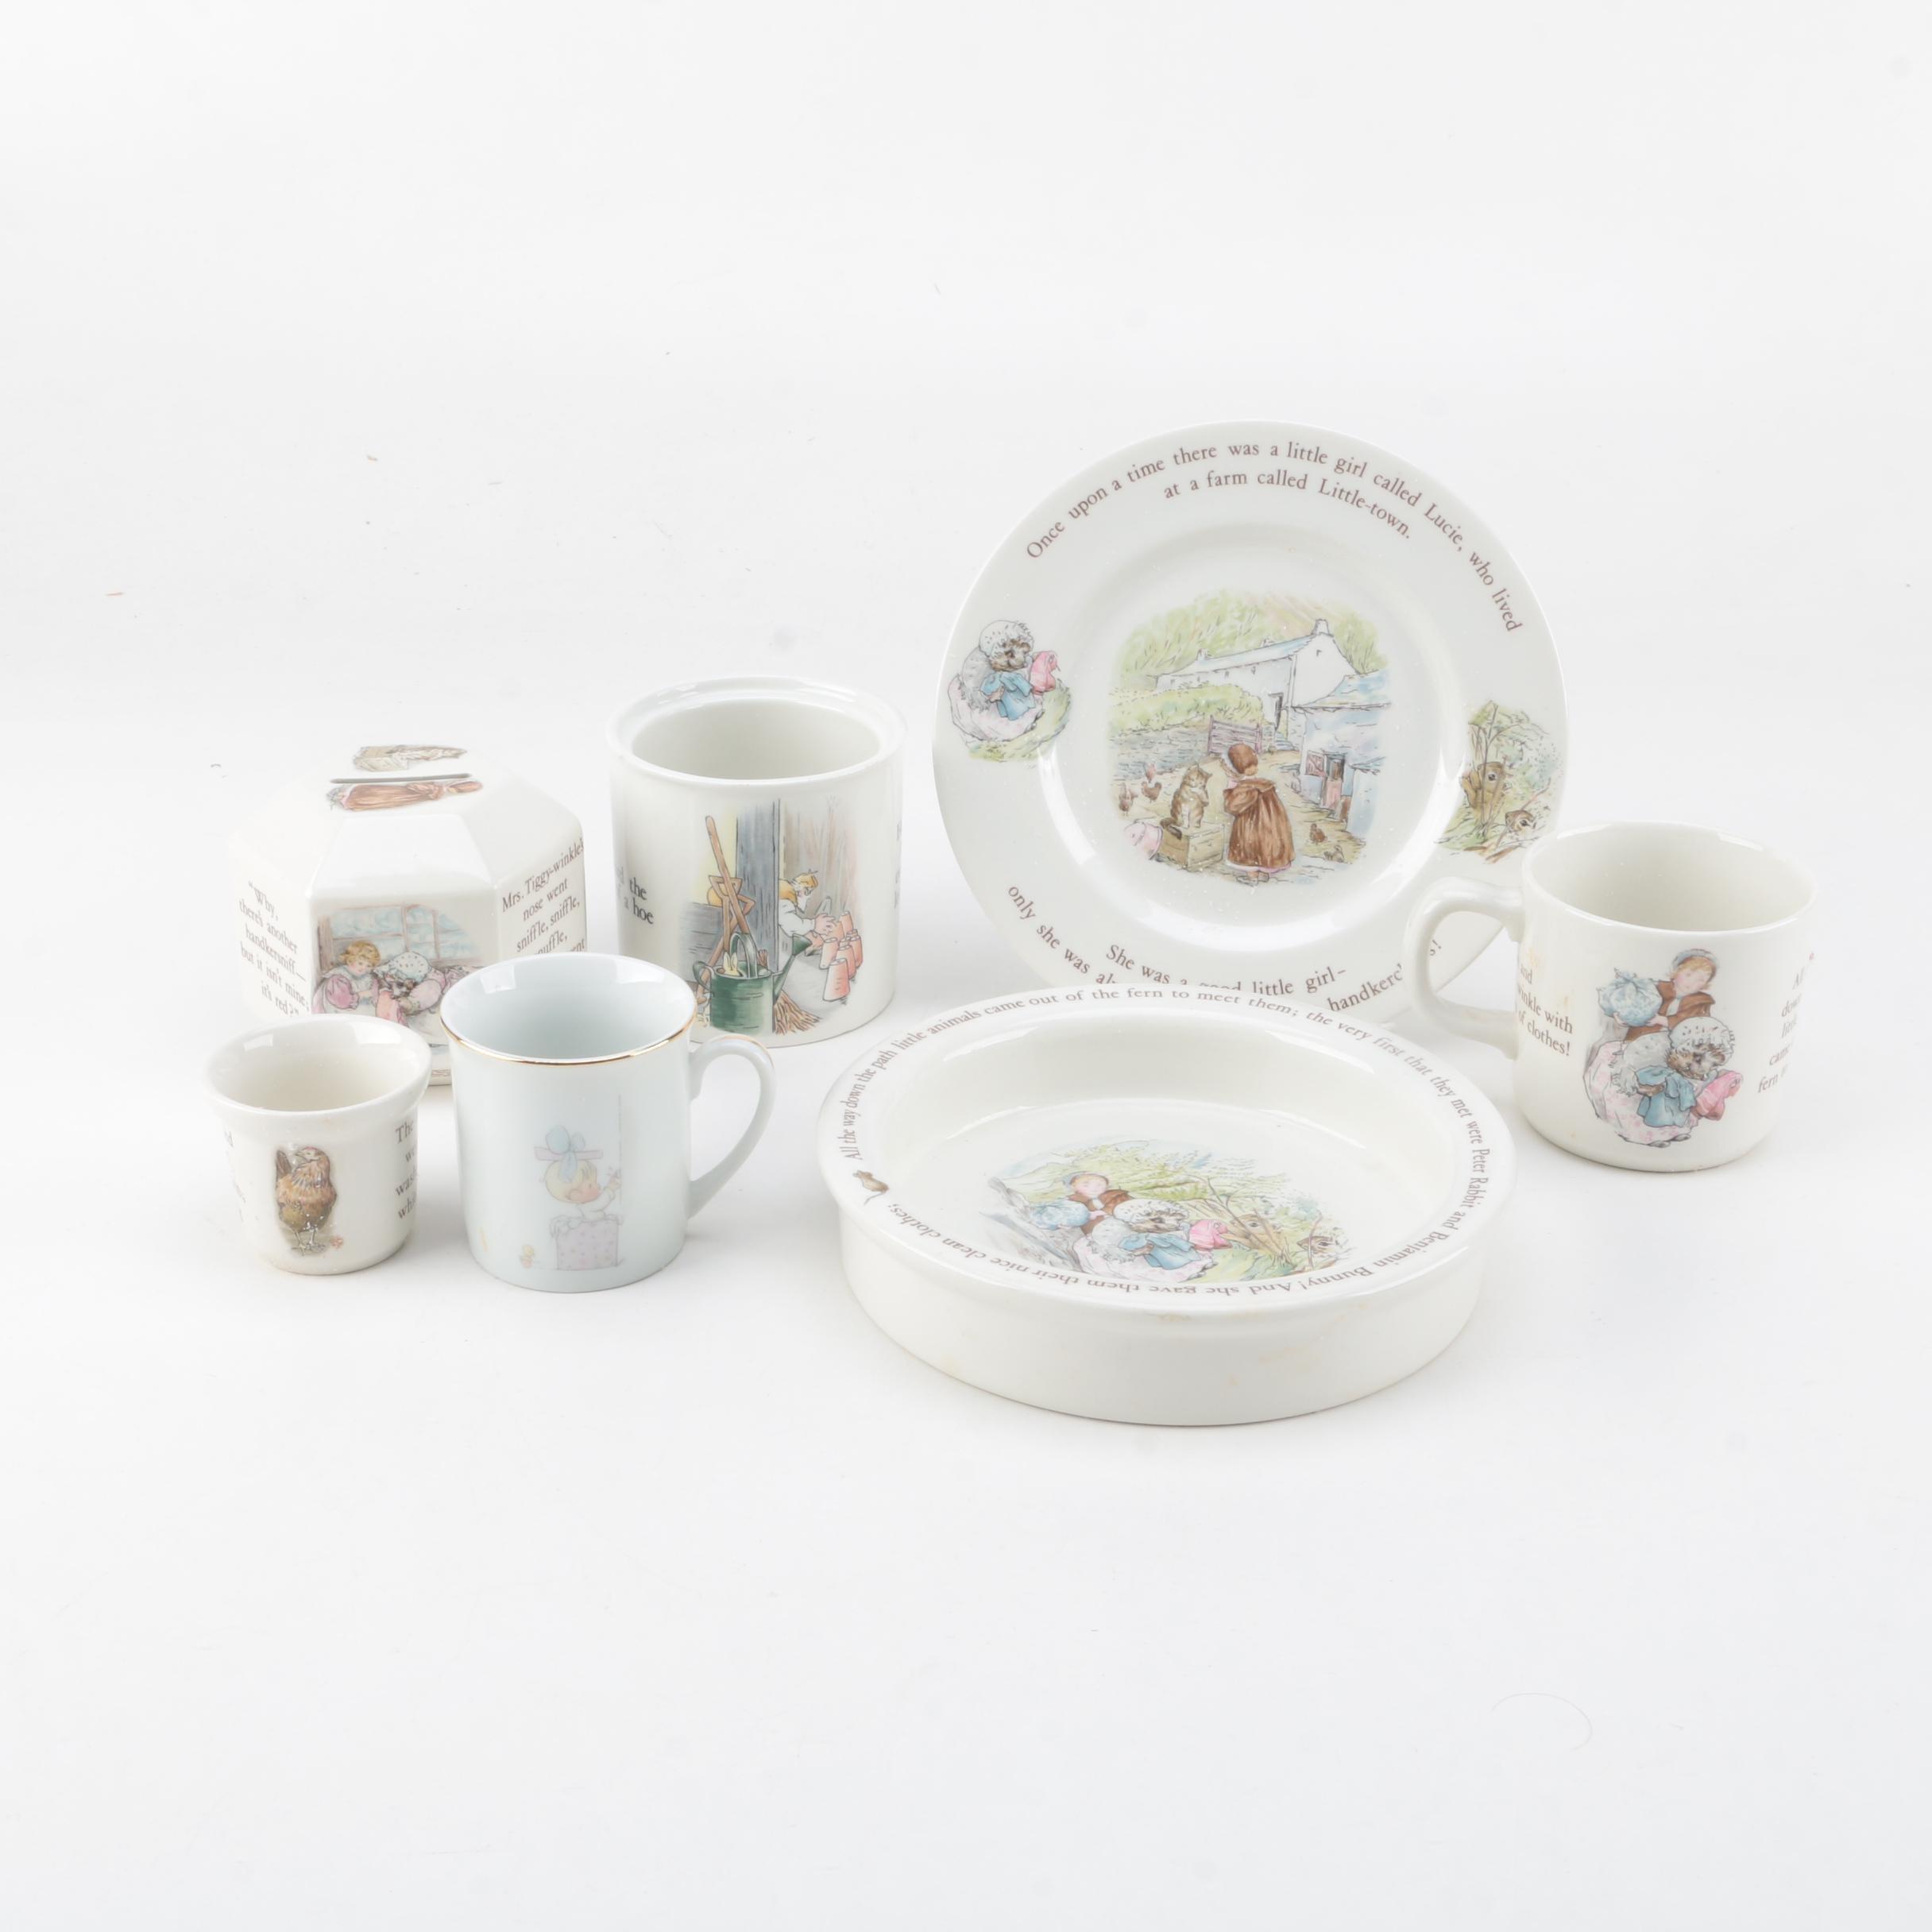 Wedgwood Beatrix Potter Porcelain Tableware ... & Wedgwood Beatrix Potter Porcelain Tableware : EBTH